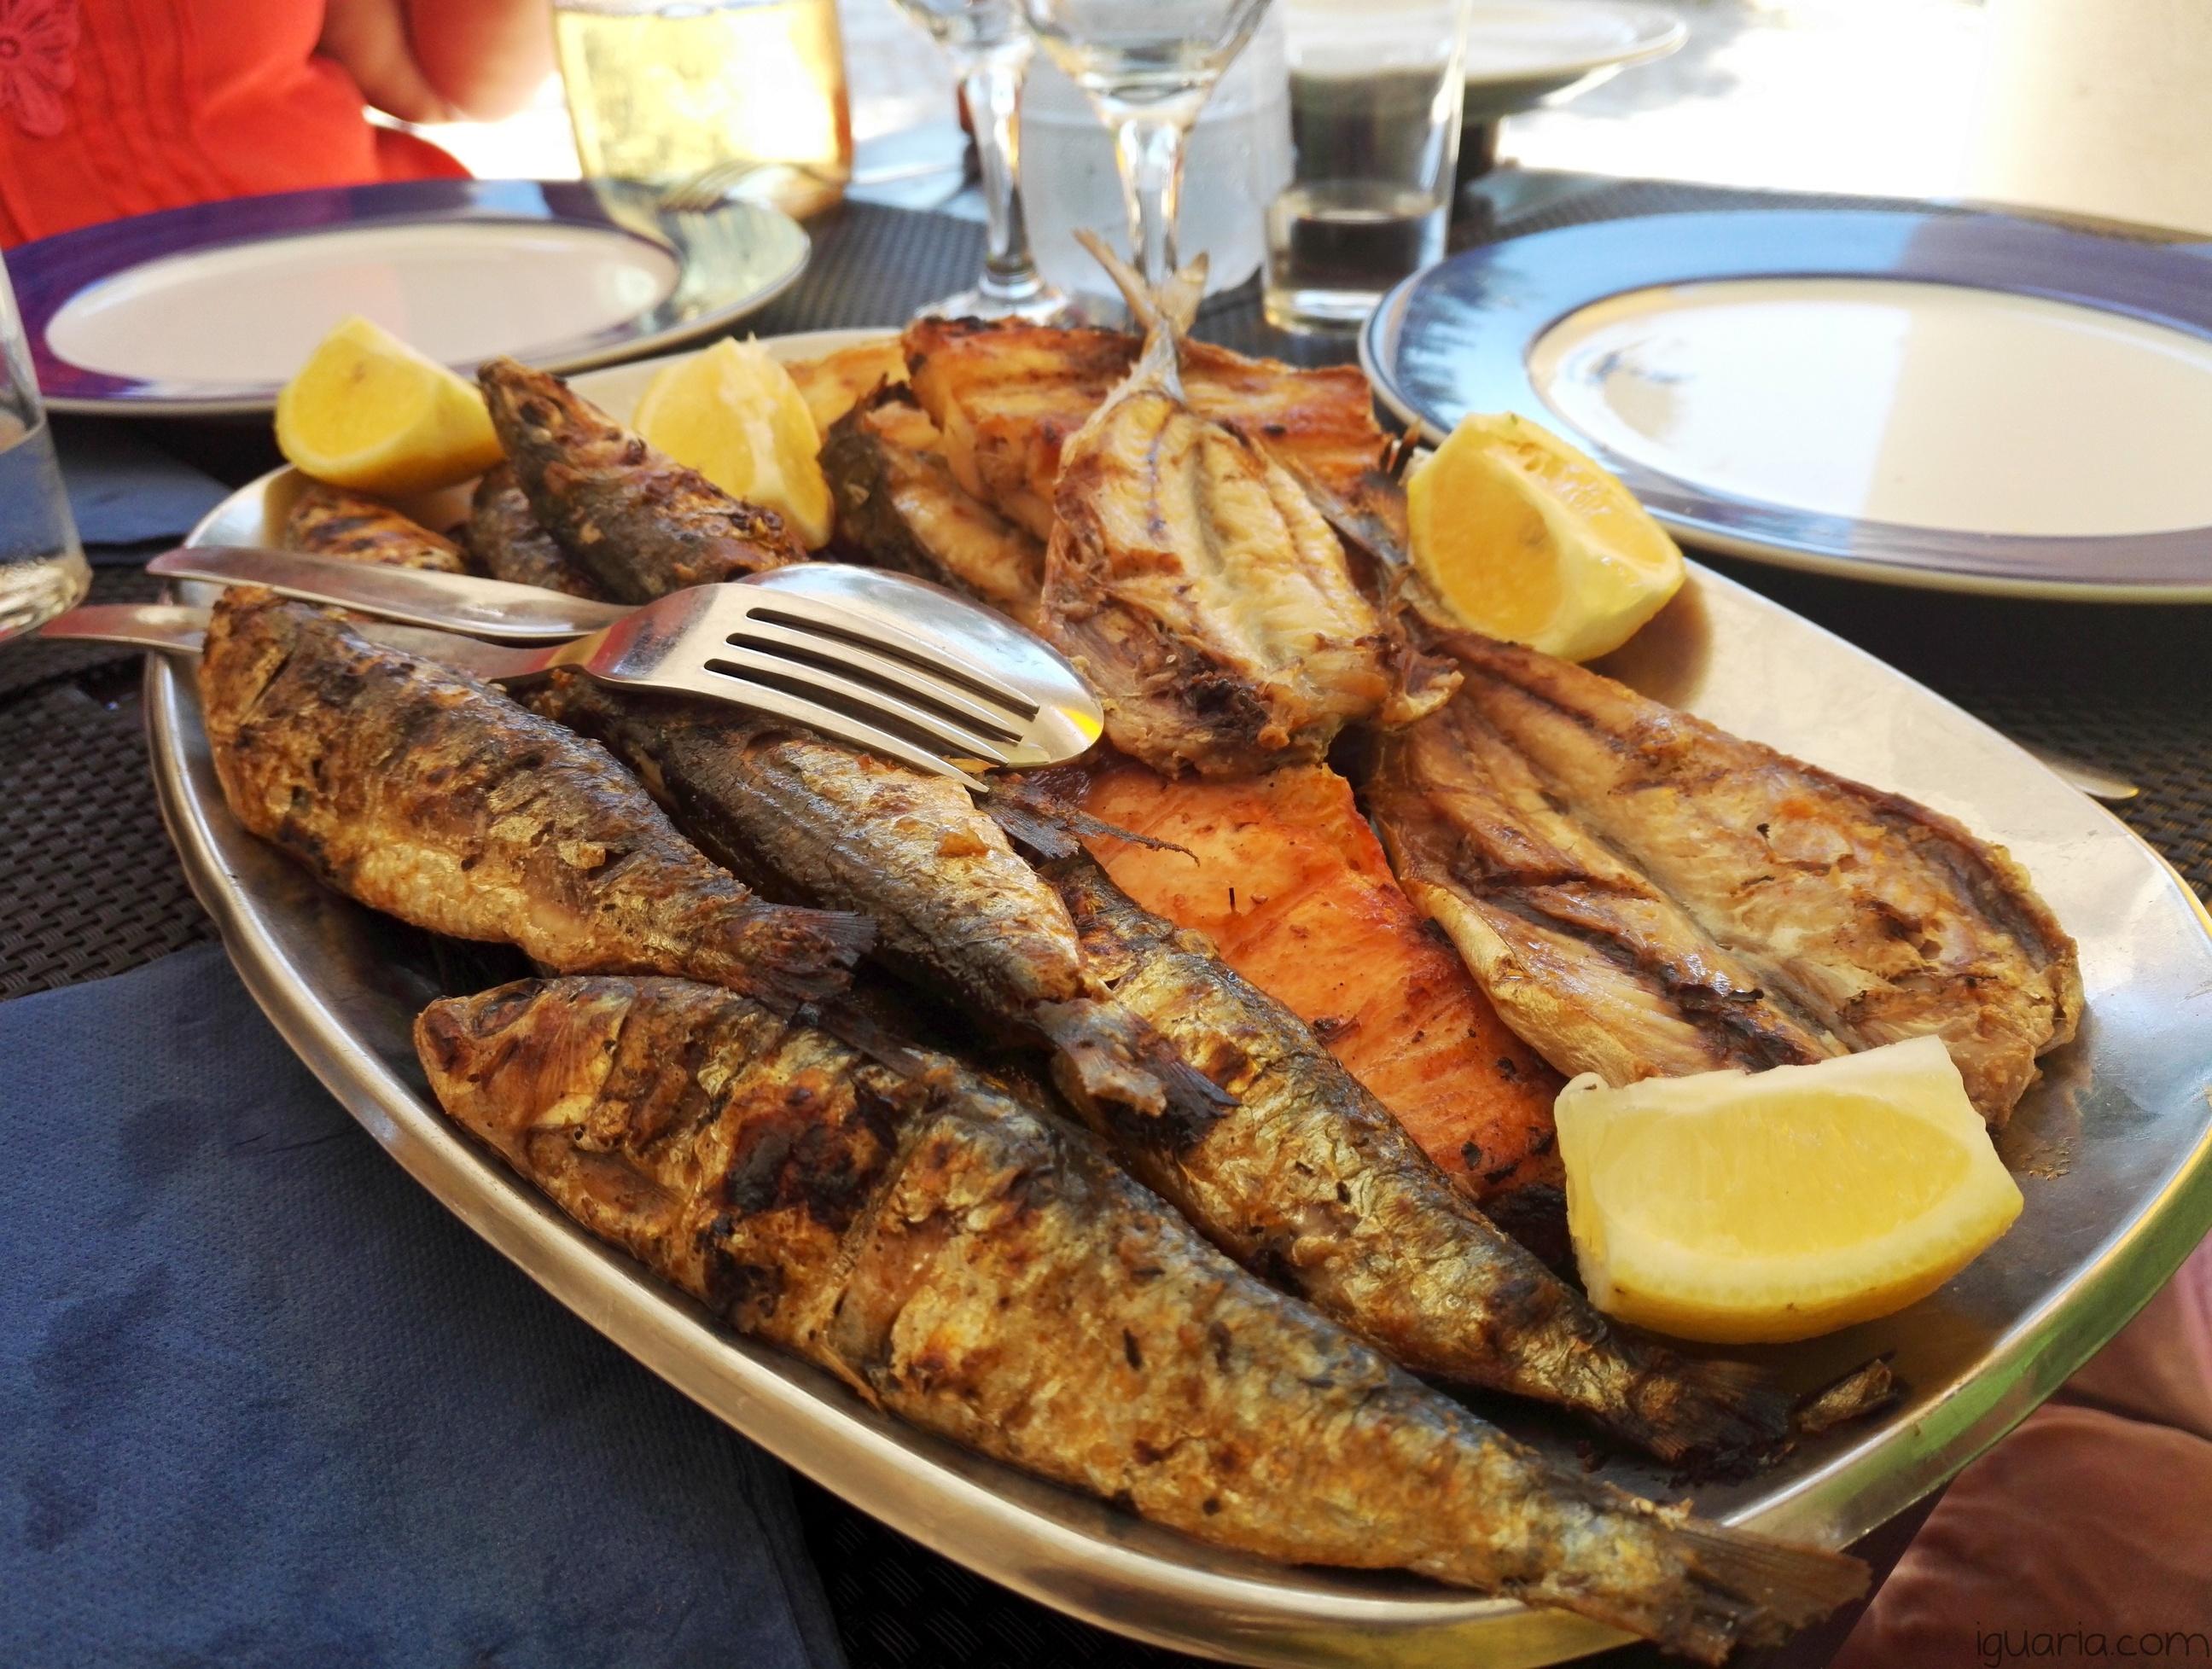 Restaurante a barrigada iguaria receita e culin ria for All you can eat fish